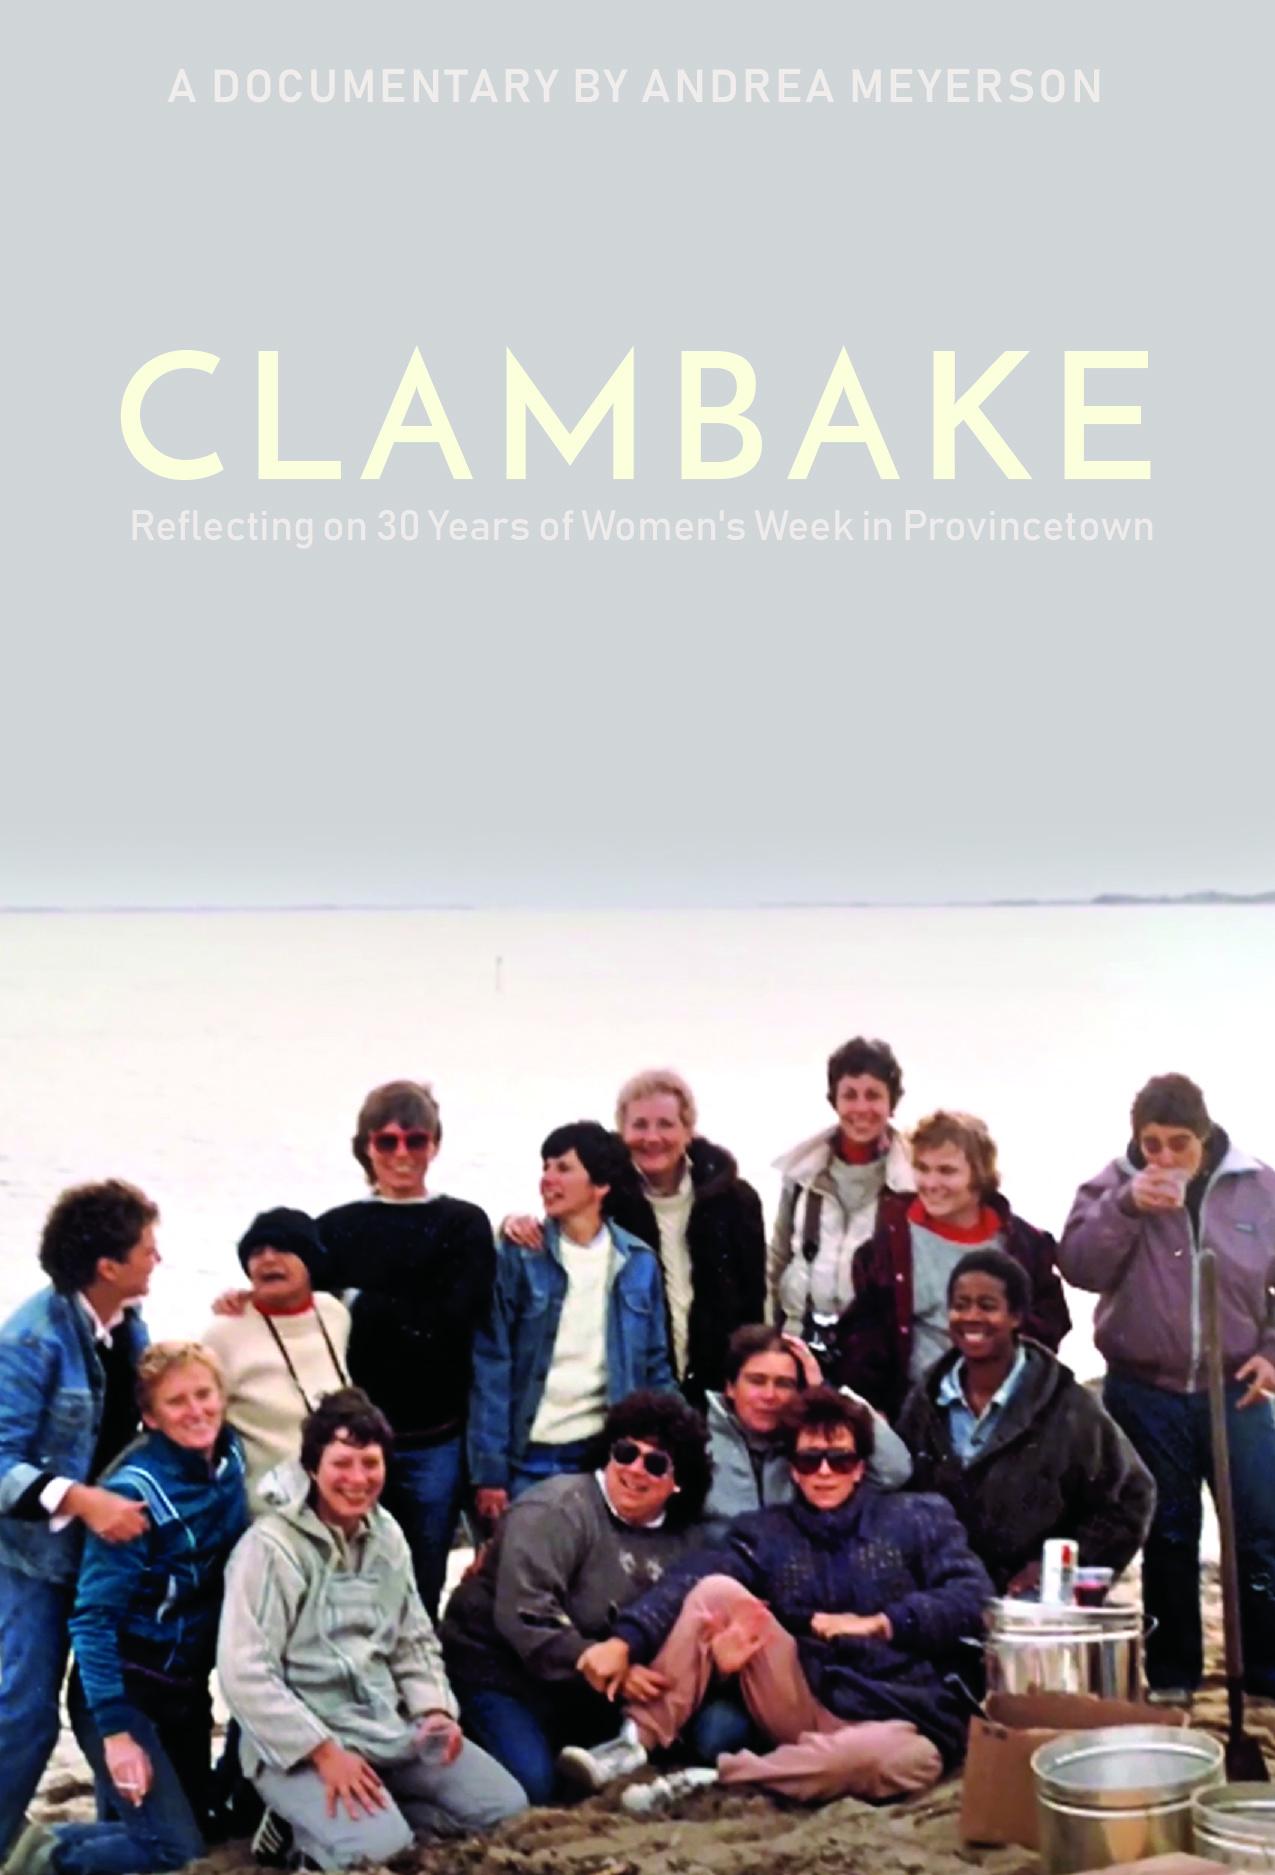 4x6_Poster_Clambake The Movie - Meyerson2.jpg